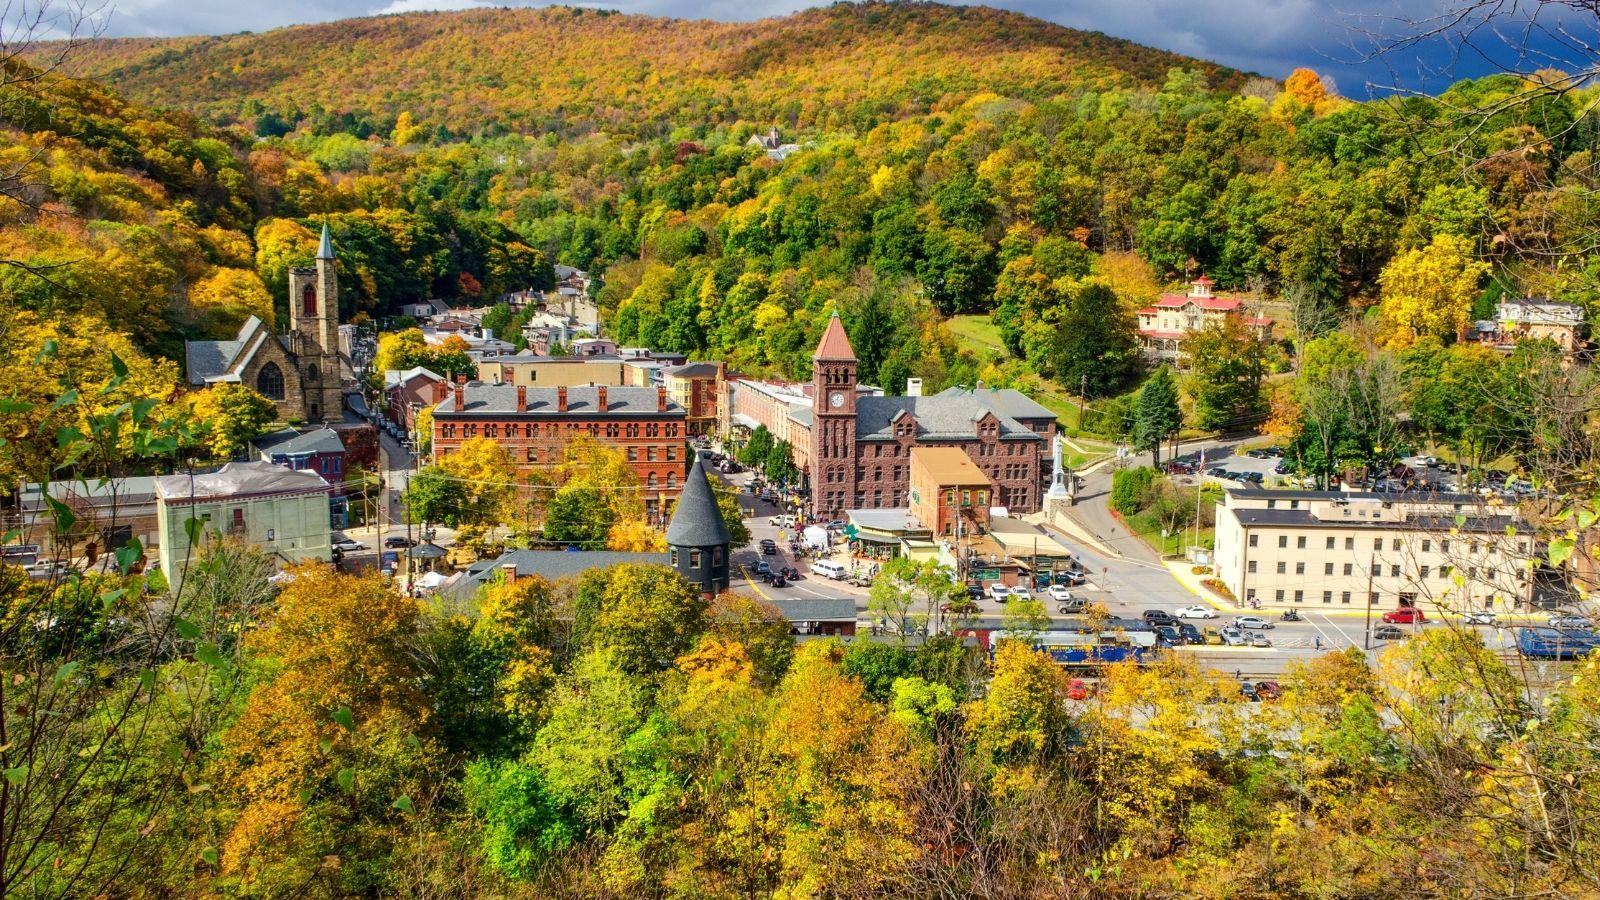 Jim Thorpe, Pennsylvania, in Autumn Colors (Photo: Shutterstock)